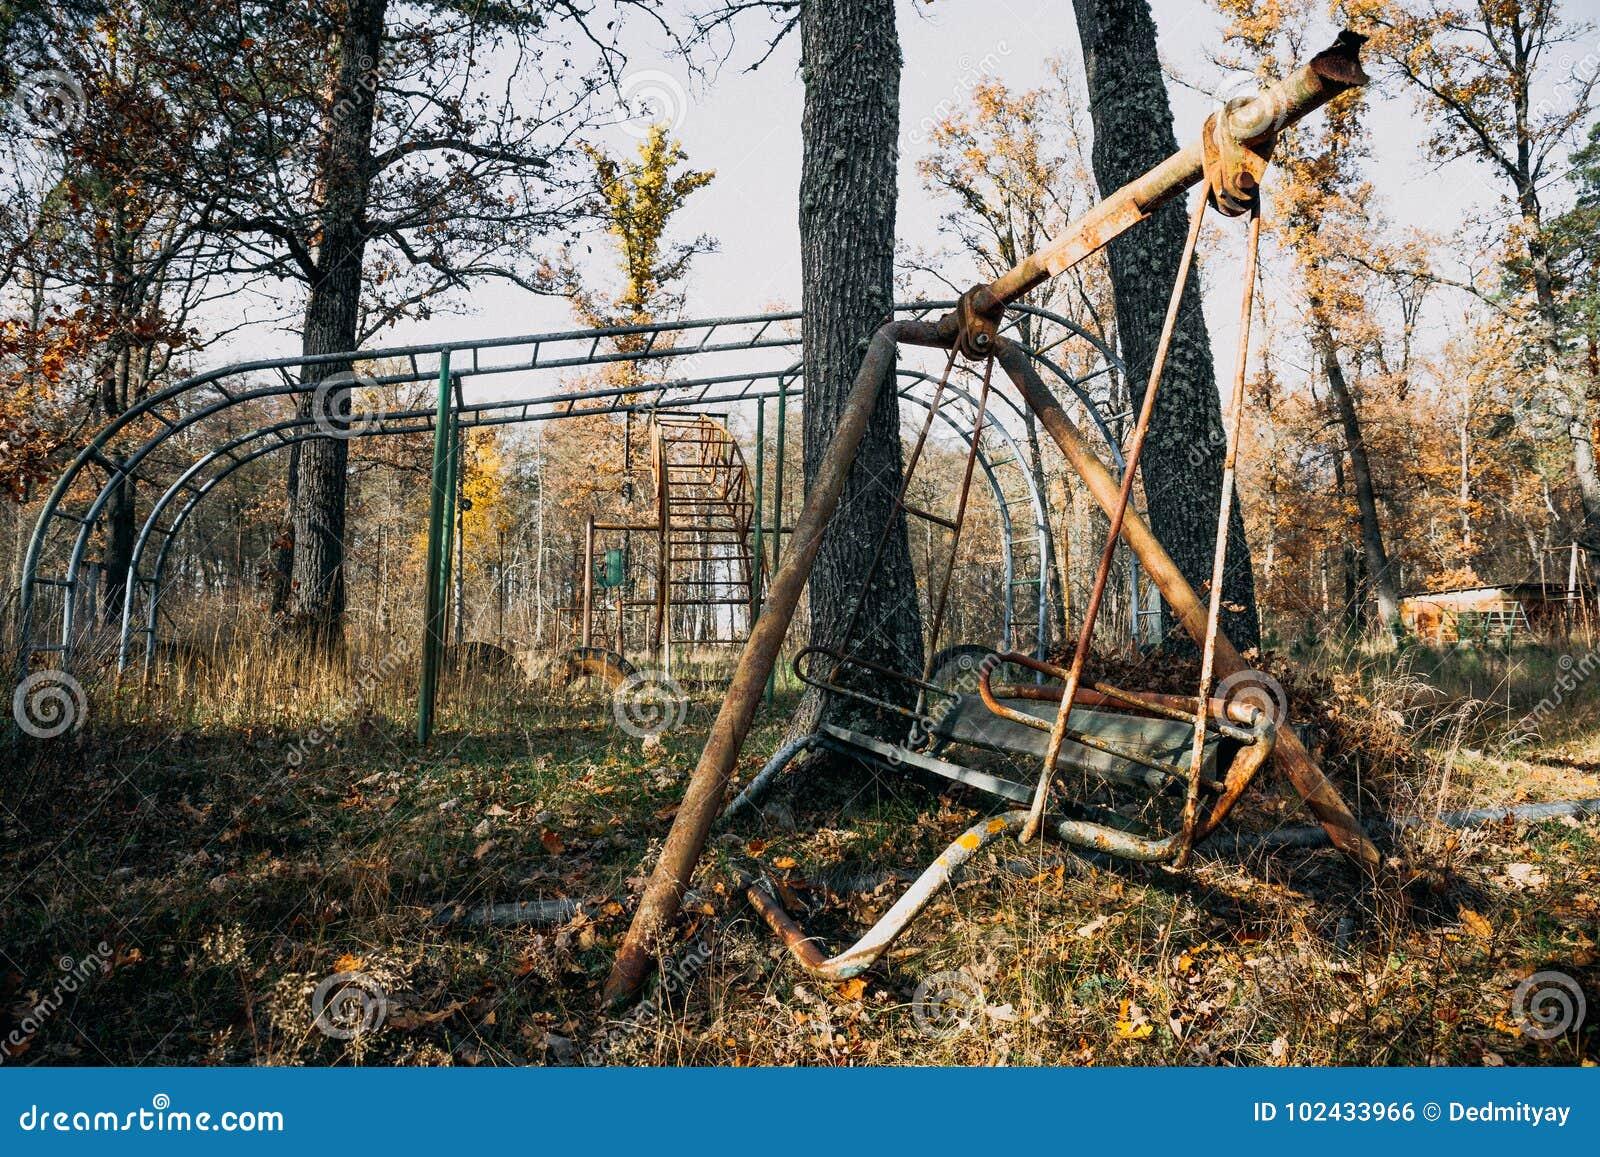 Creepy Abandoned Children Playground Among Autumn Trees Rusty Swing Stock Photo Image Of Exercise Game 102433966